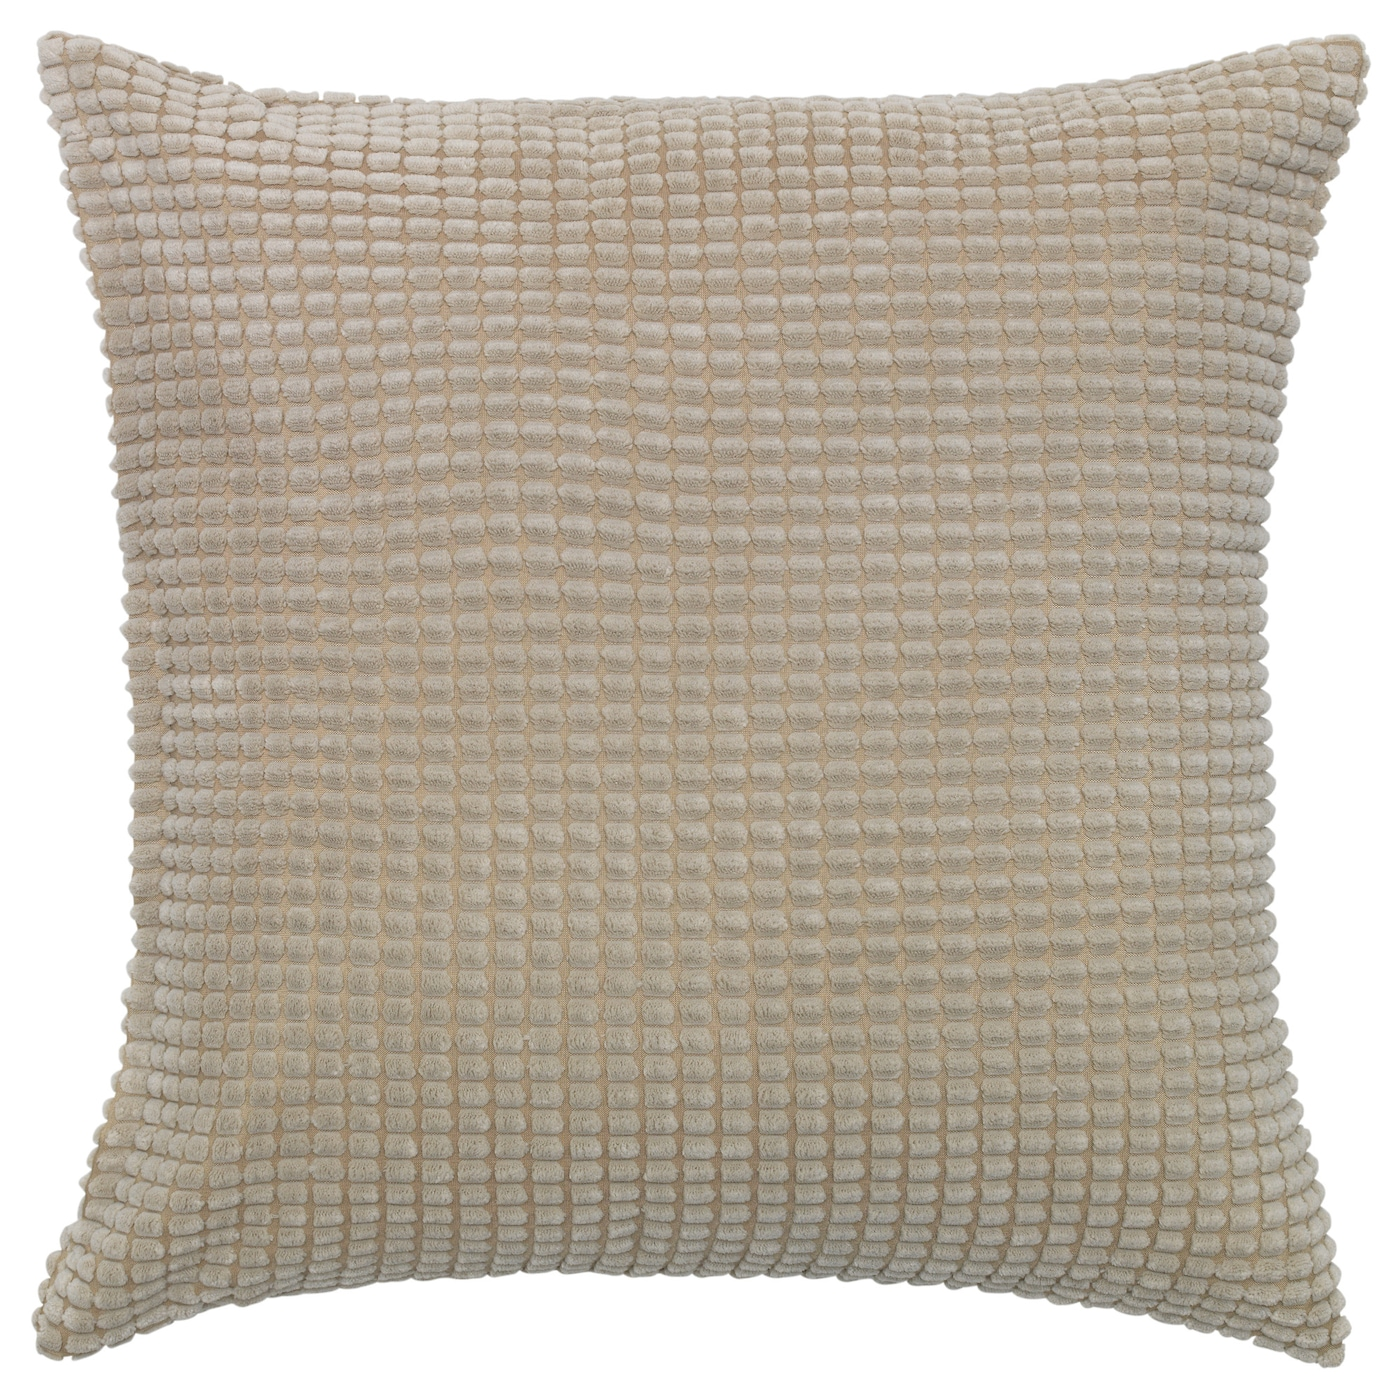 gullklocka kussenovertrek beige 50x50 cm ikea. Black Bedroom Furniture Sets. Home Design Ideas